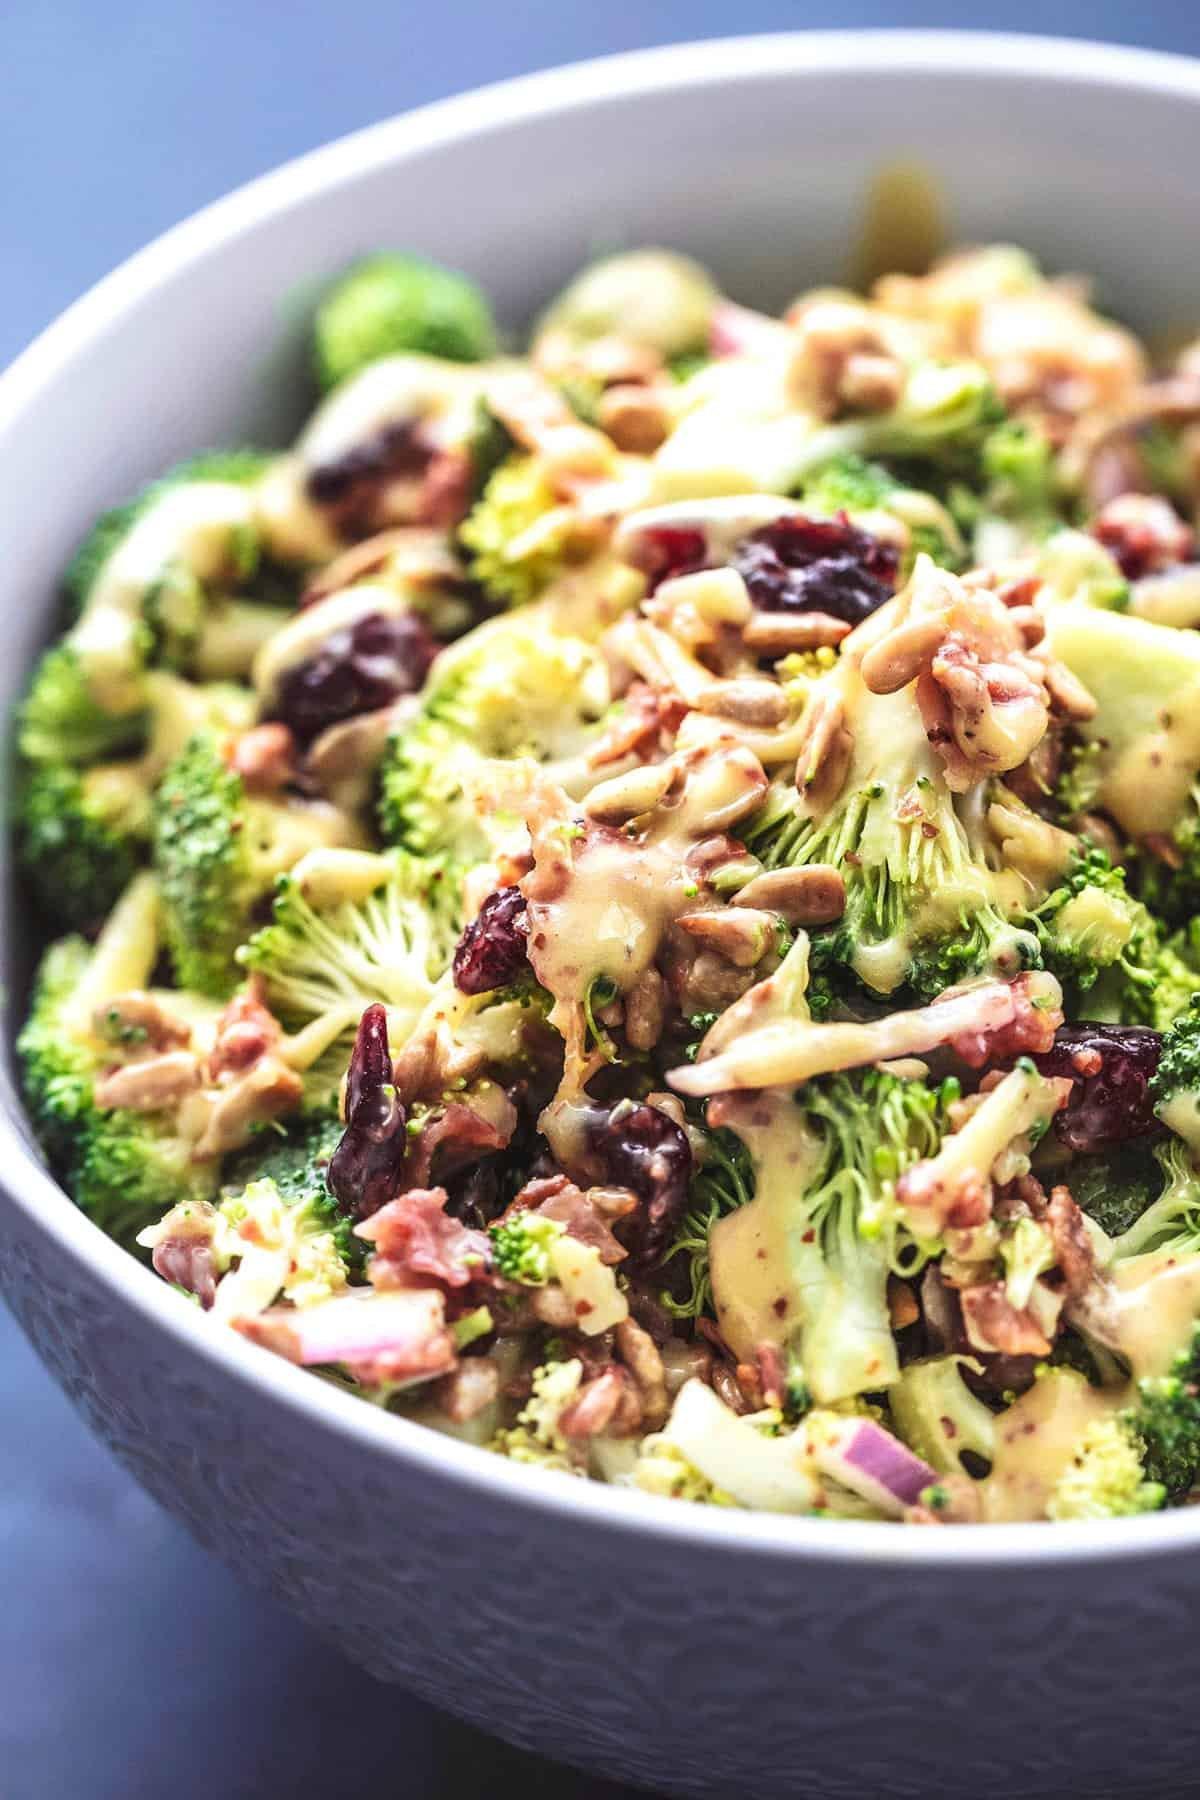 Best Broccoli Salad Recipe (Without Mayo)